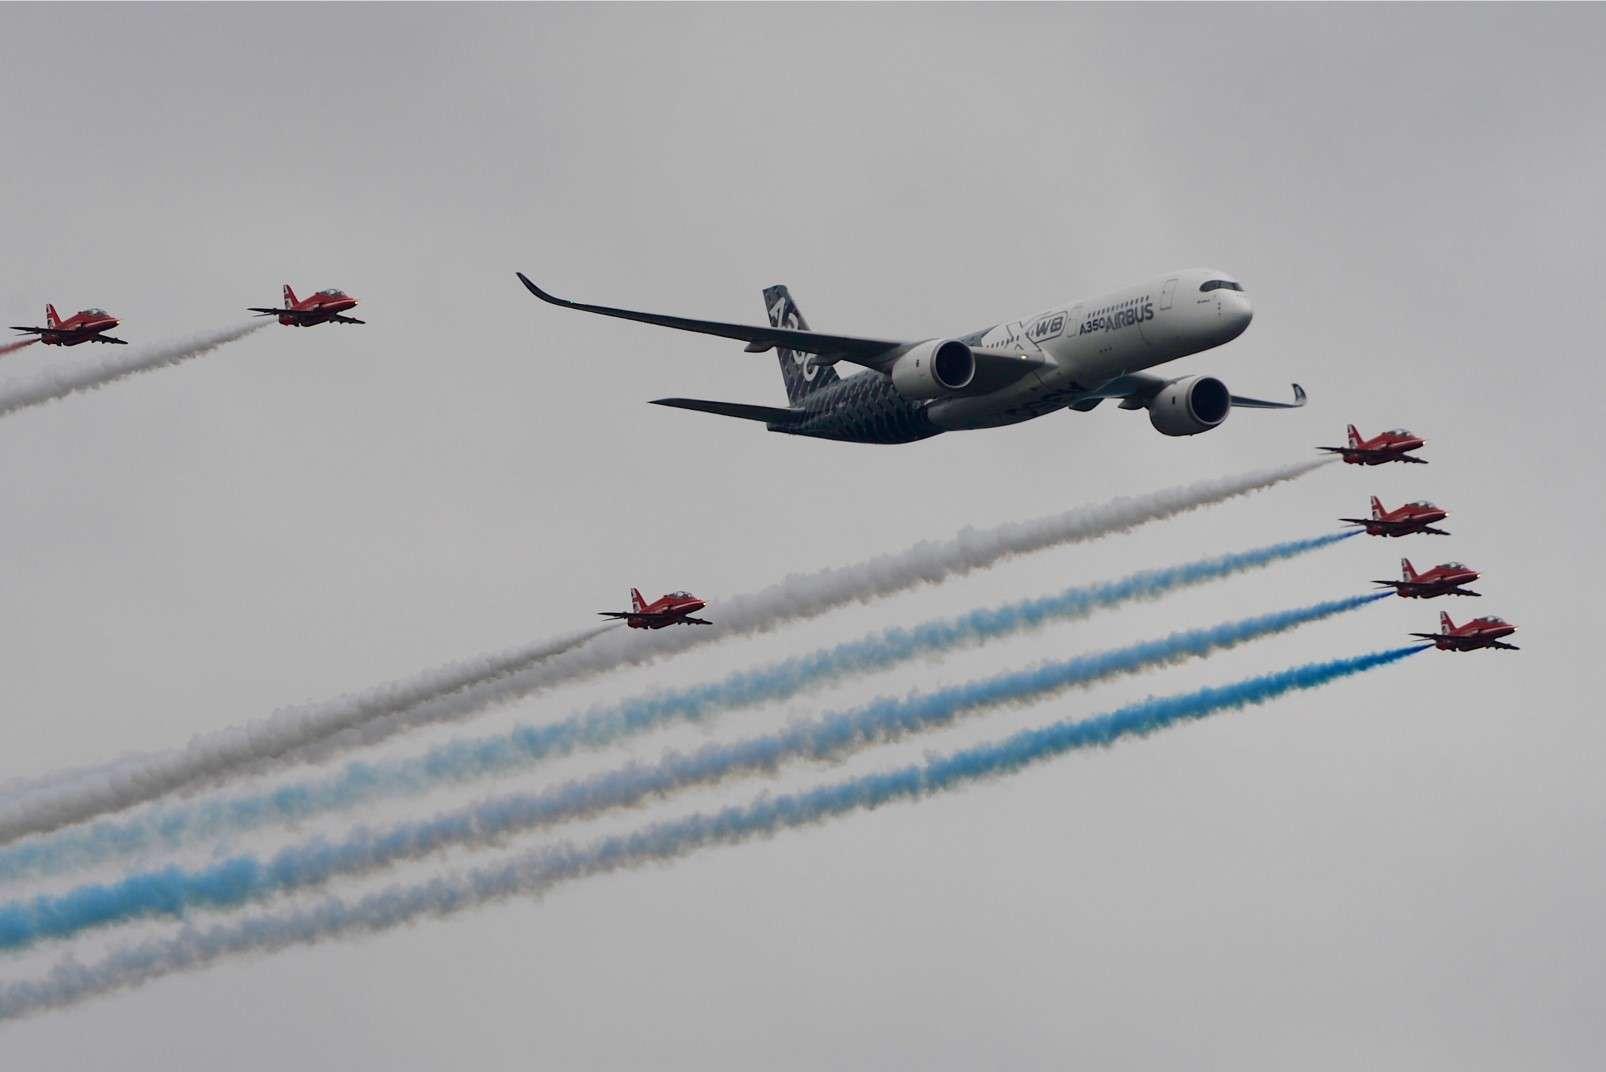 Farnborough International Airshow 16-22 July 2018